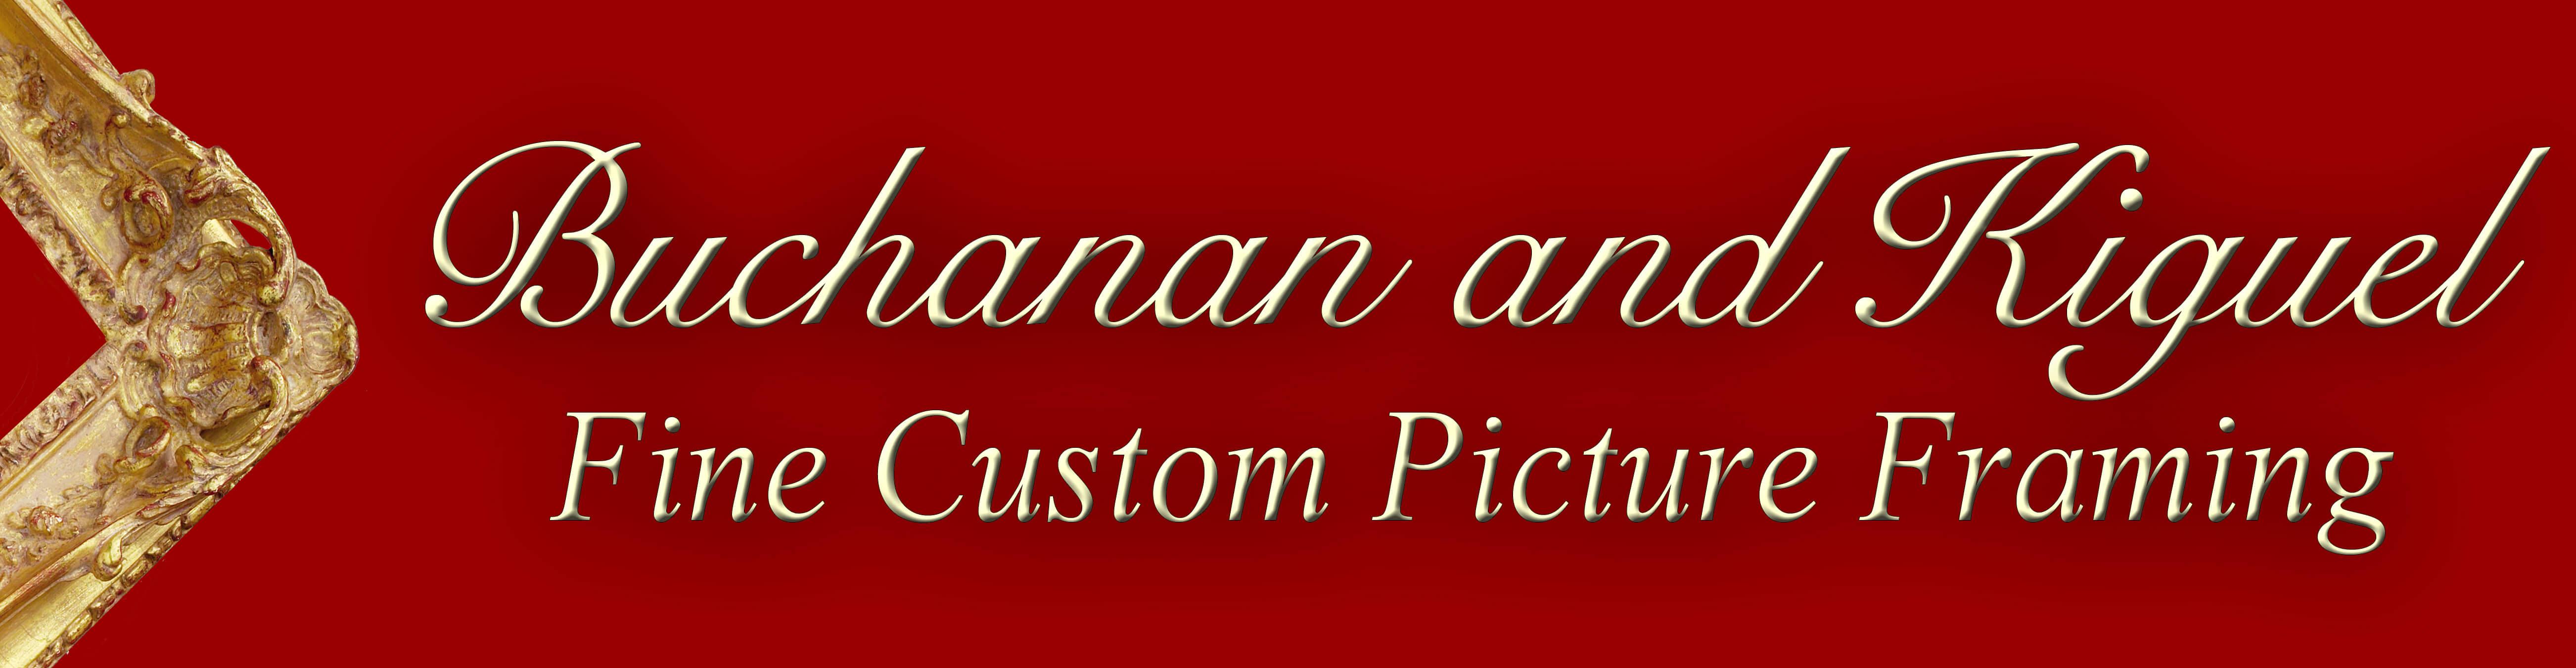 Buchanan & Kiguel Fine Custom Picture Framing image 2